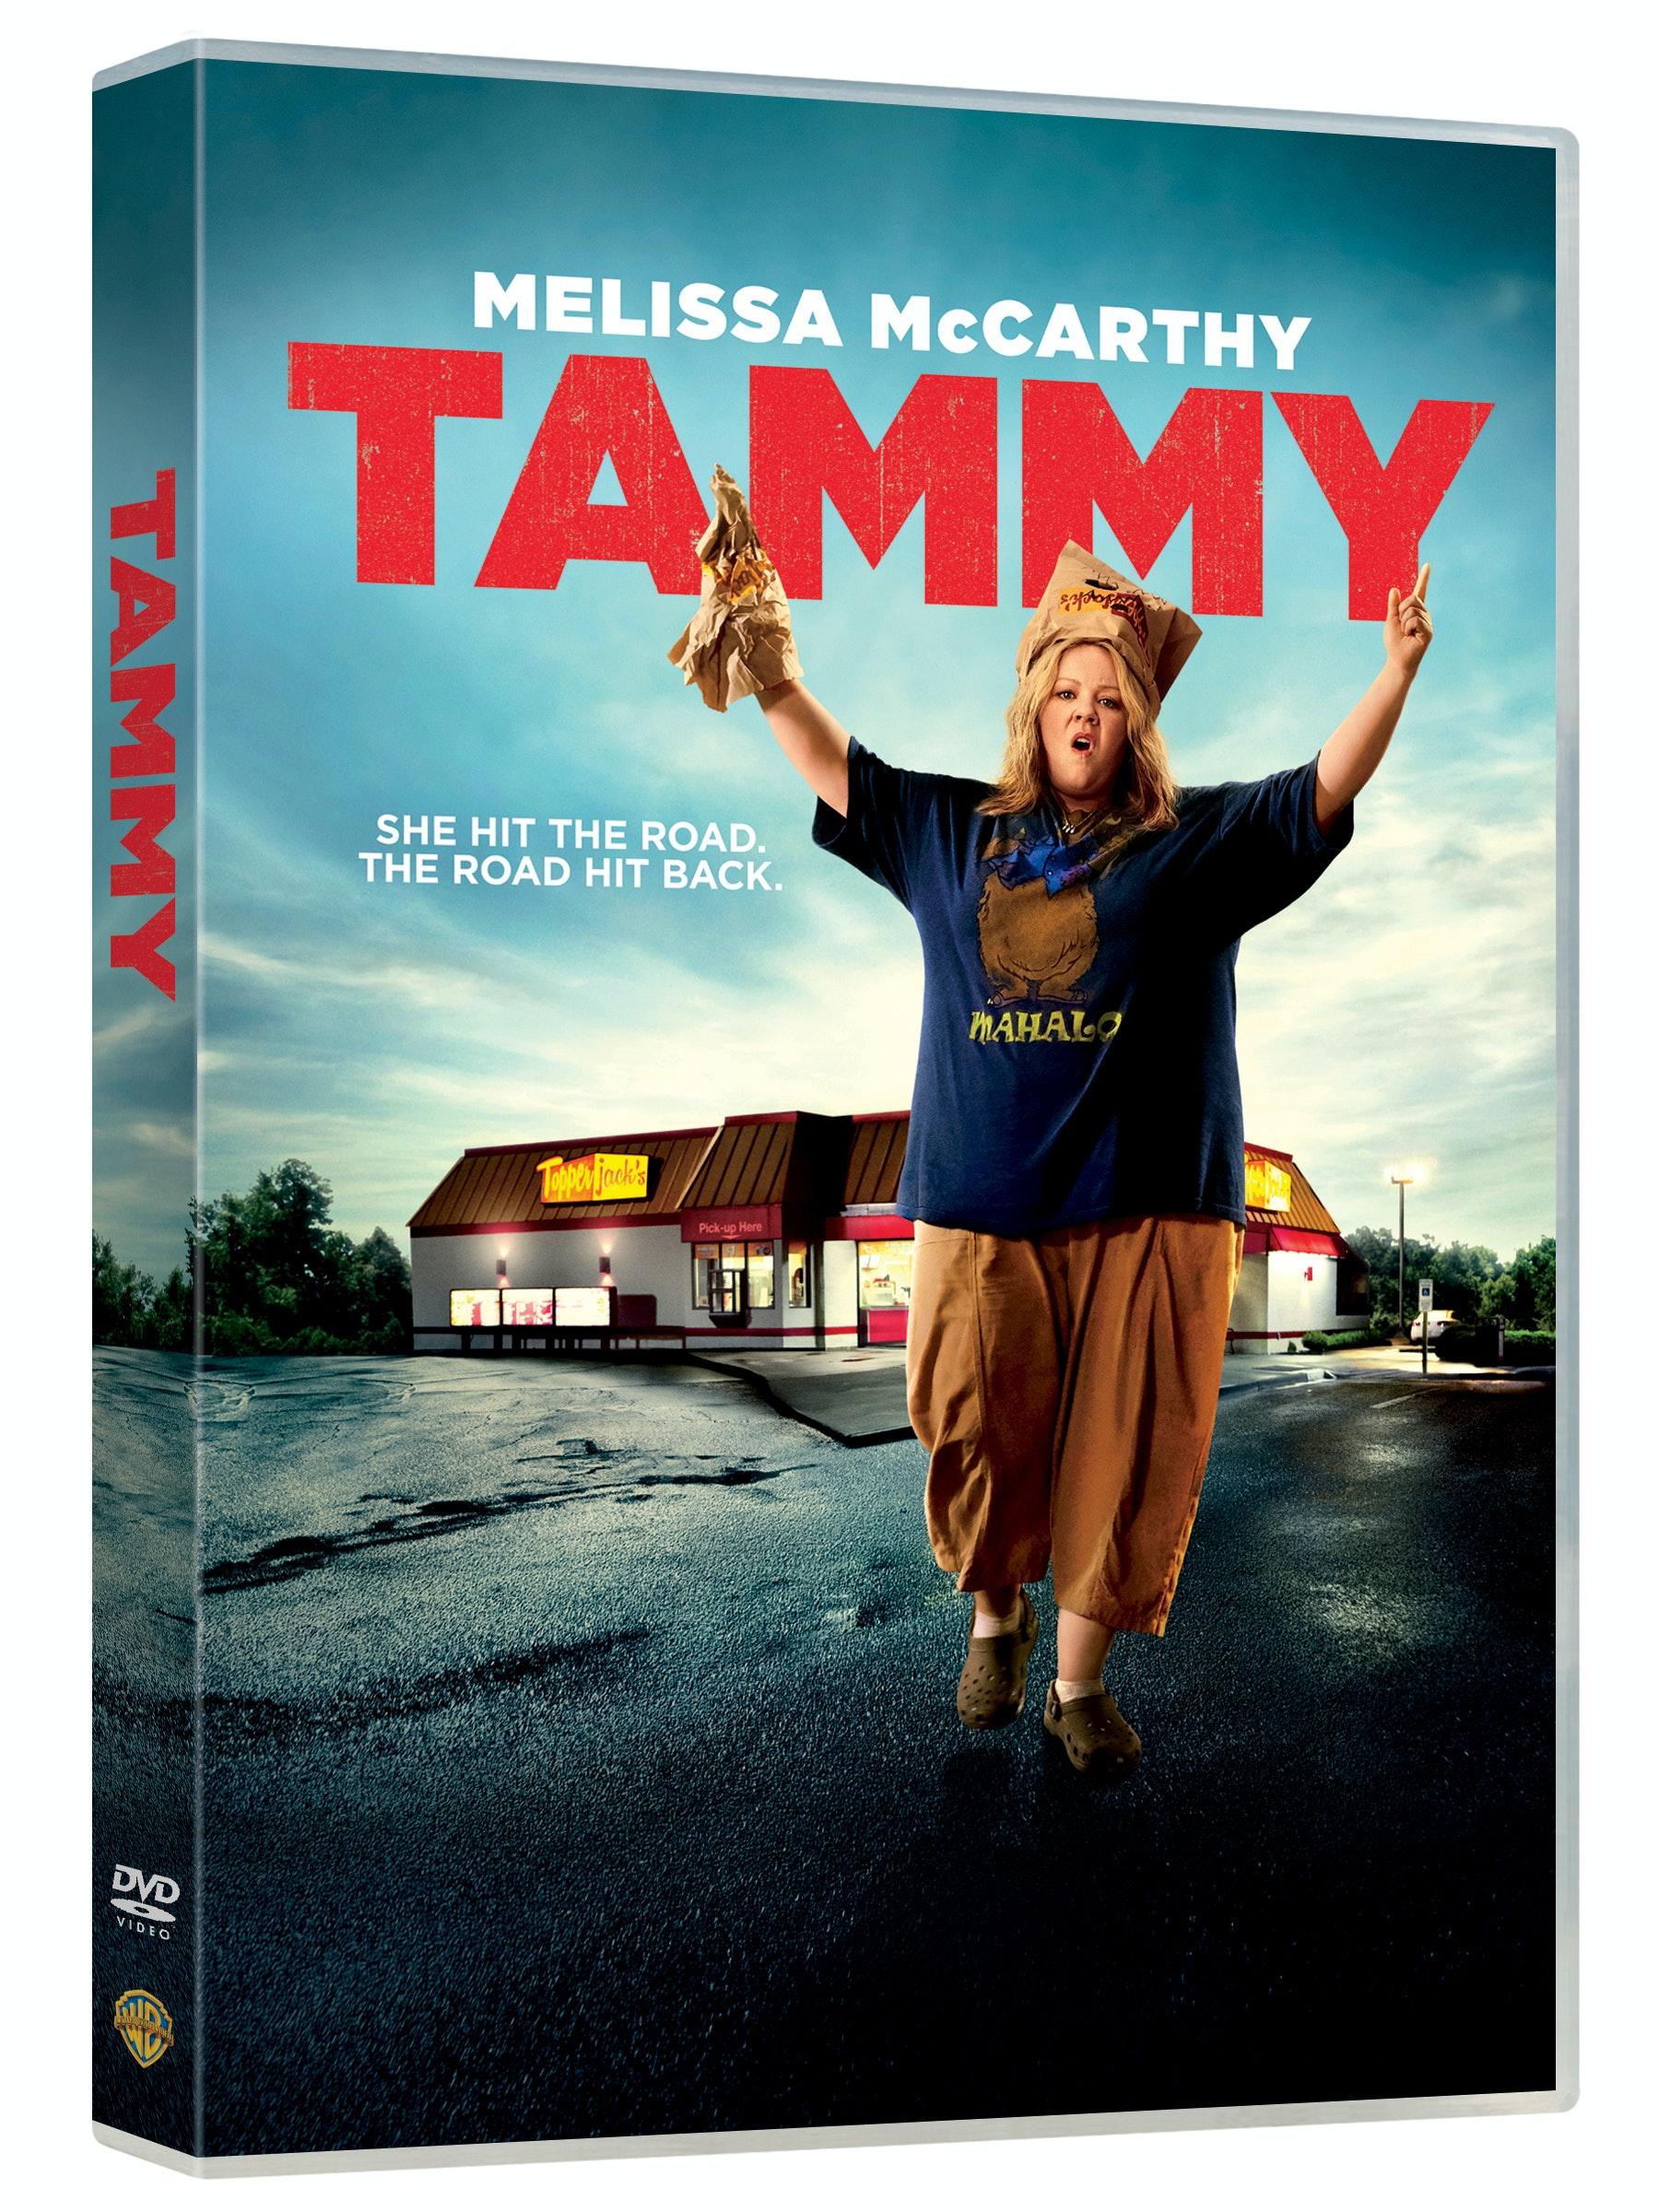 Tammy sweepstakes